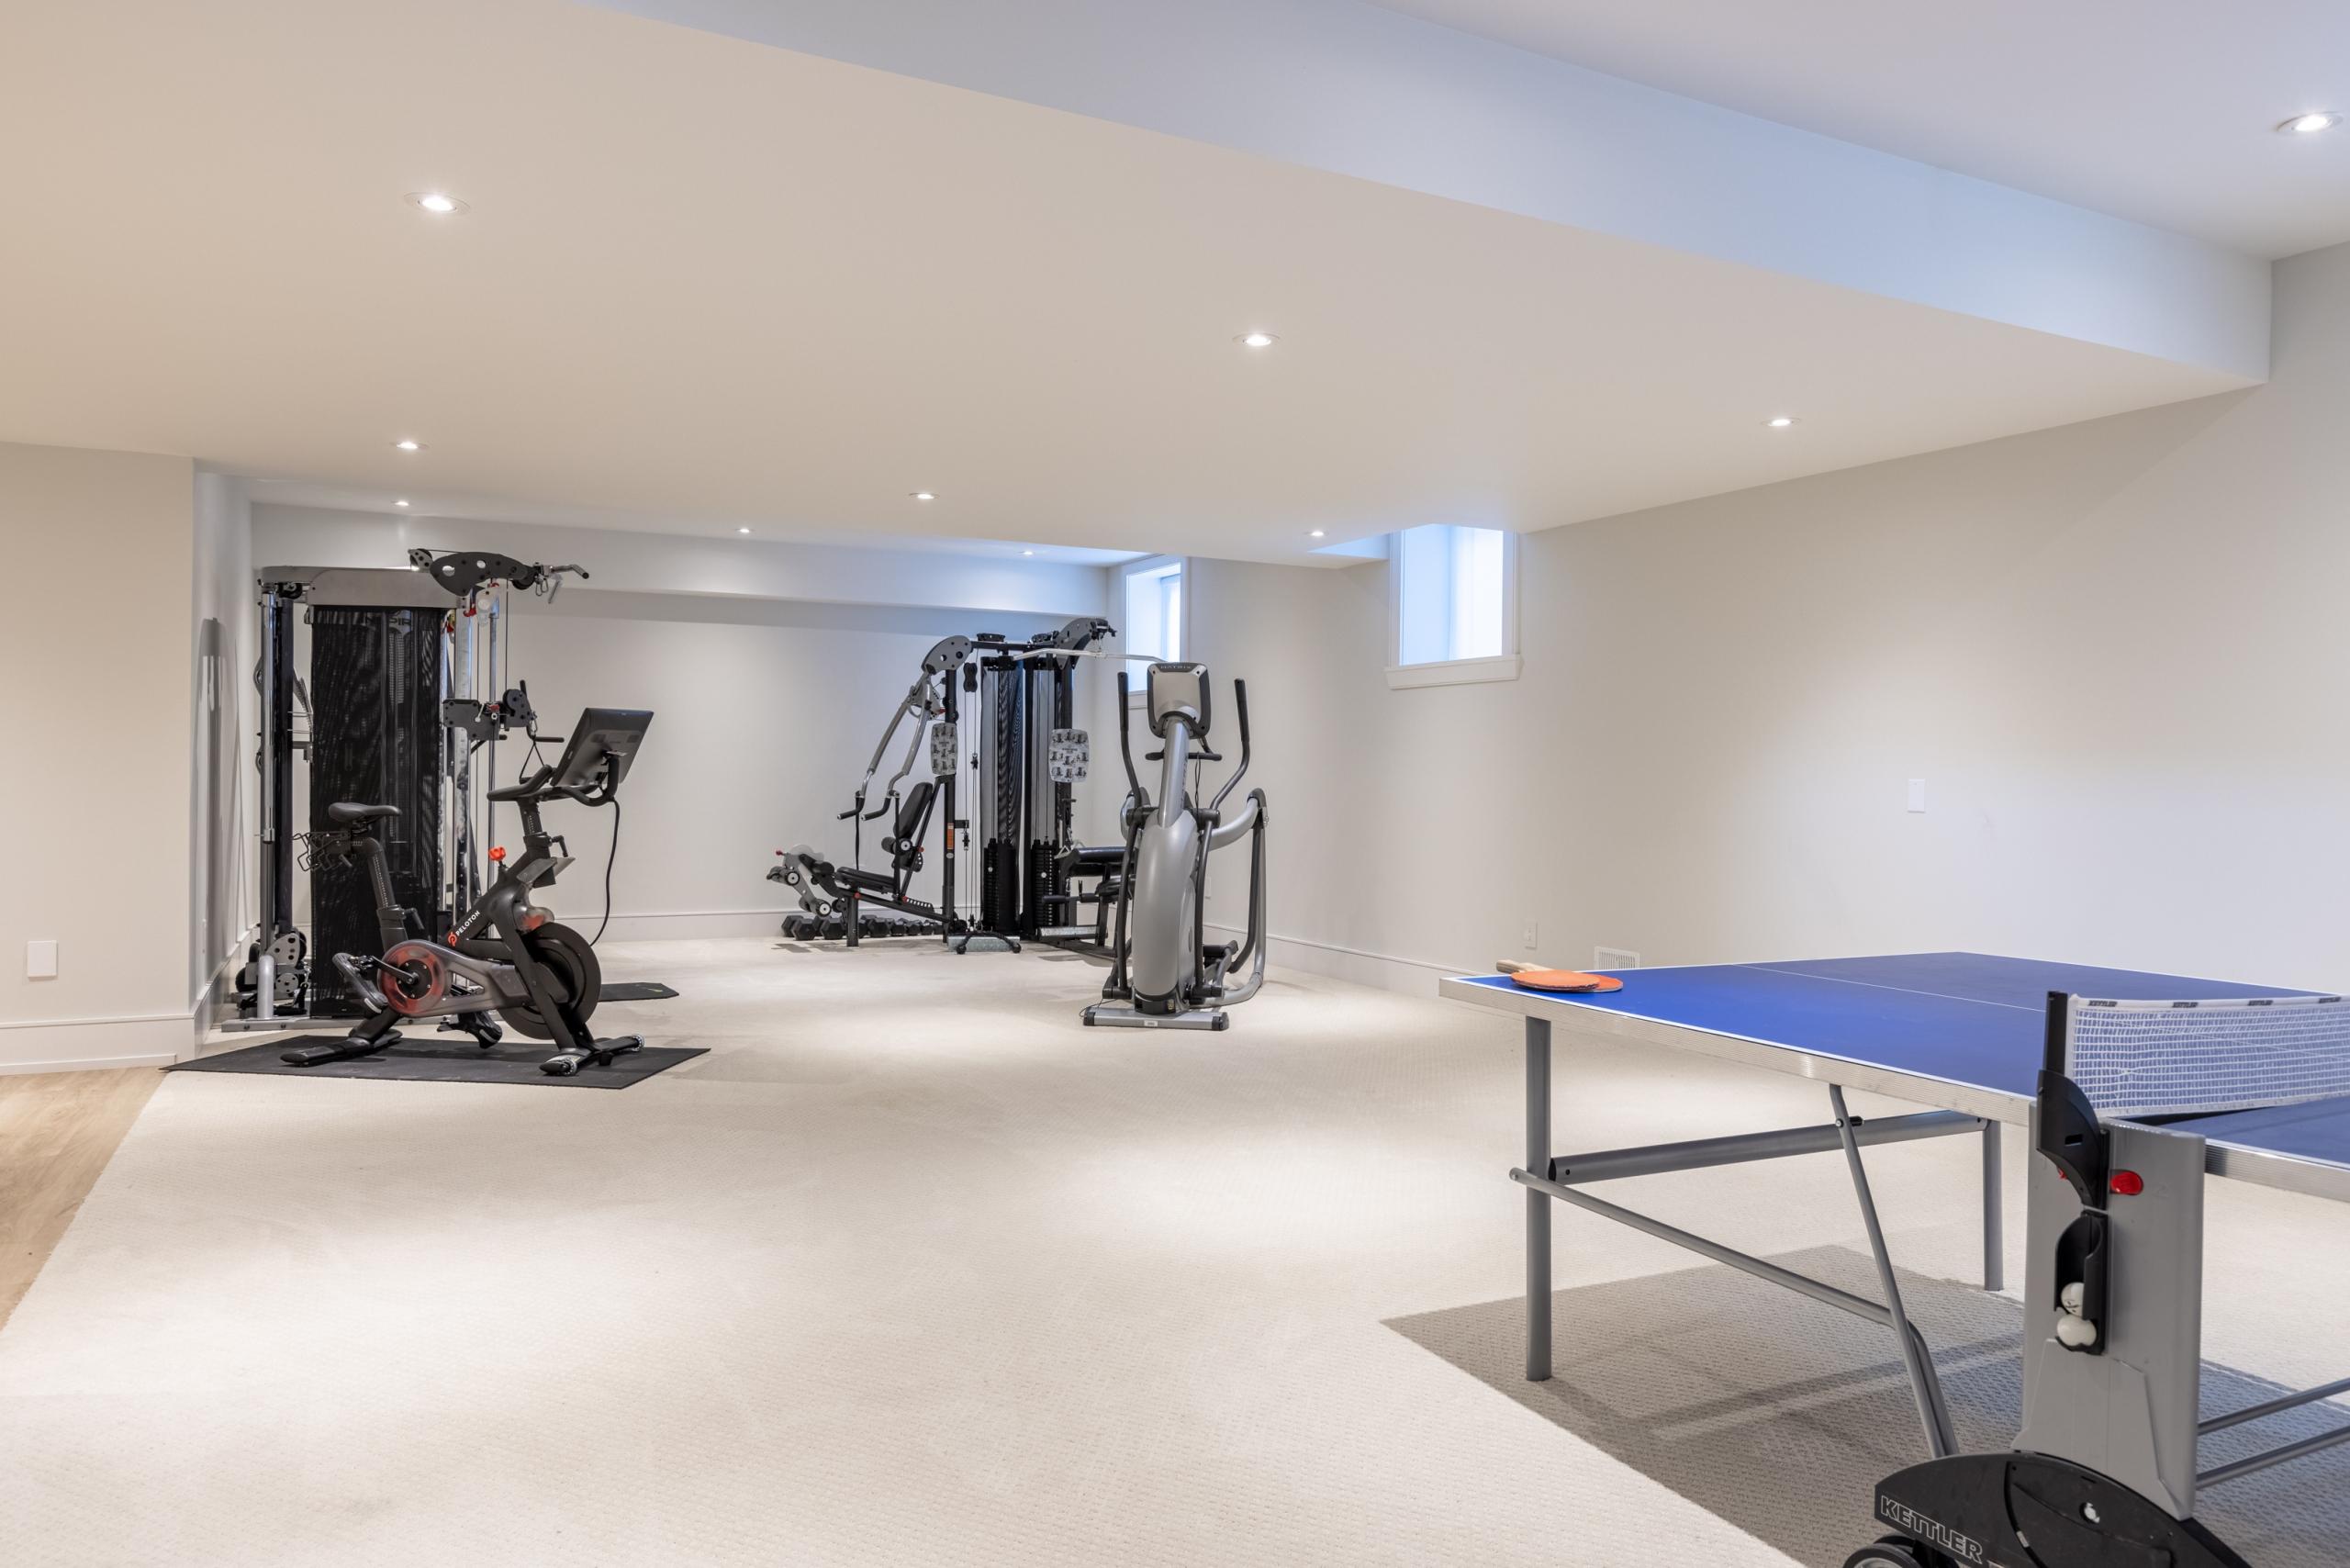 Gym featured at 489 Lakeshore Road W, Oakville at Alex Irish & Associates